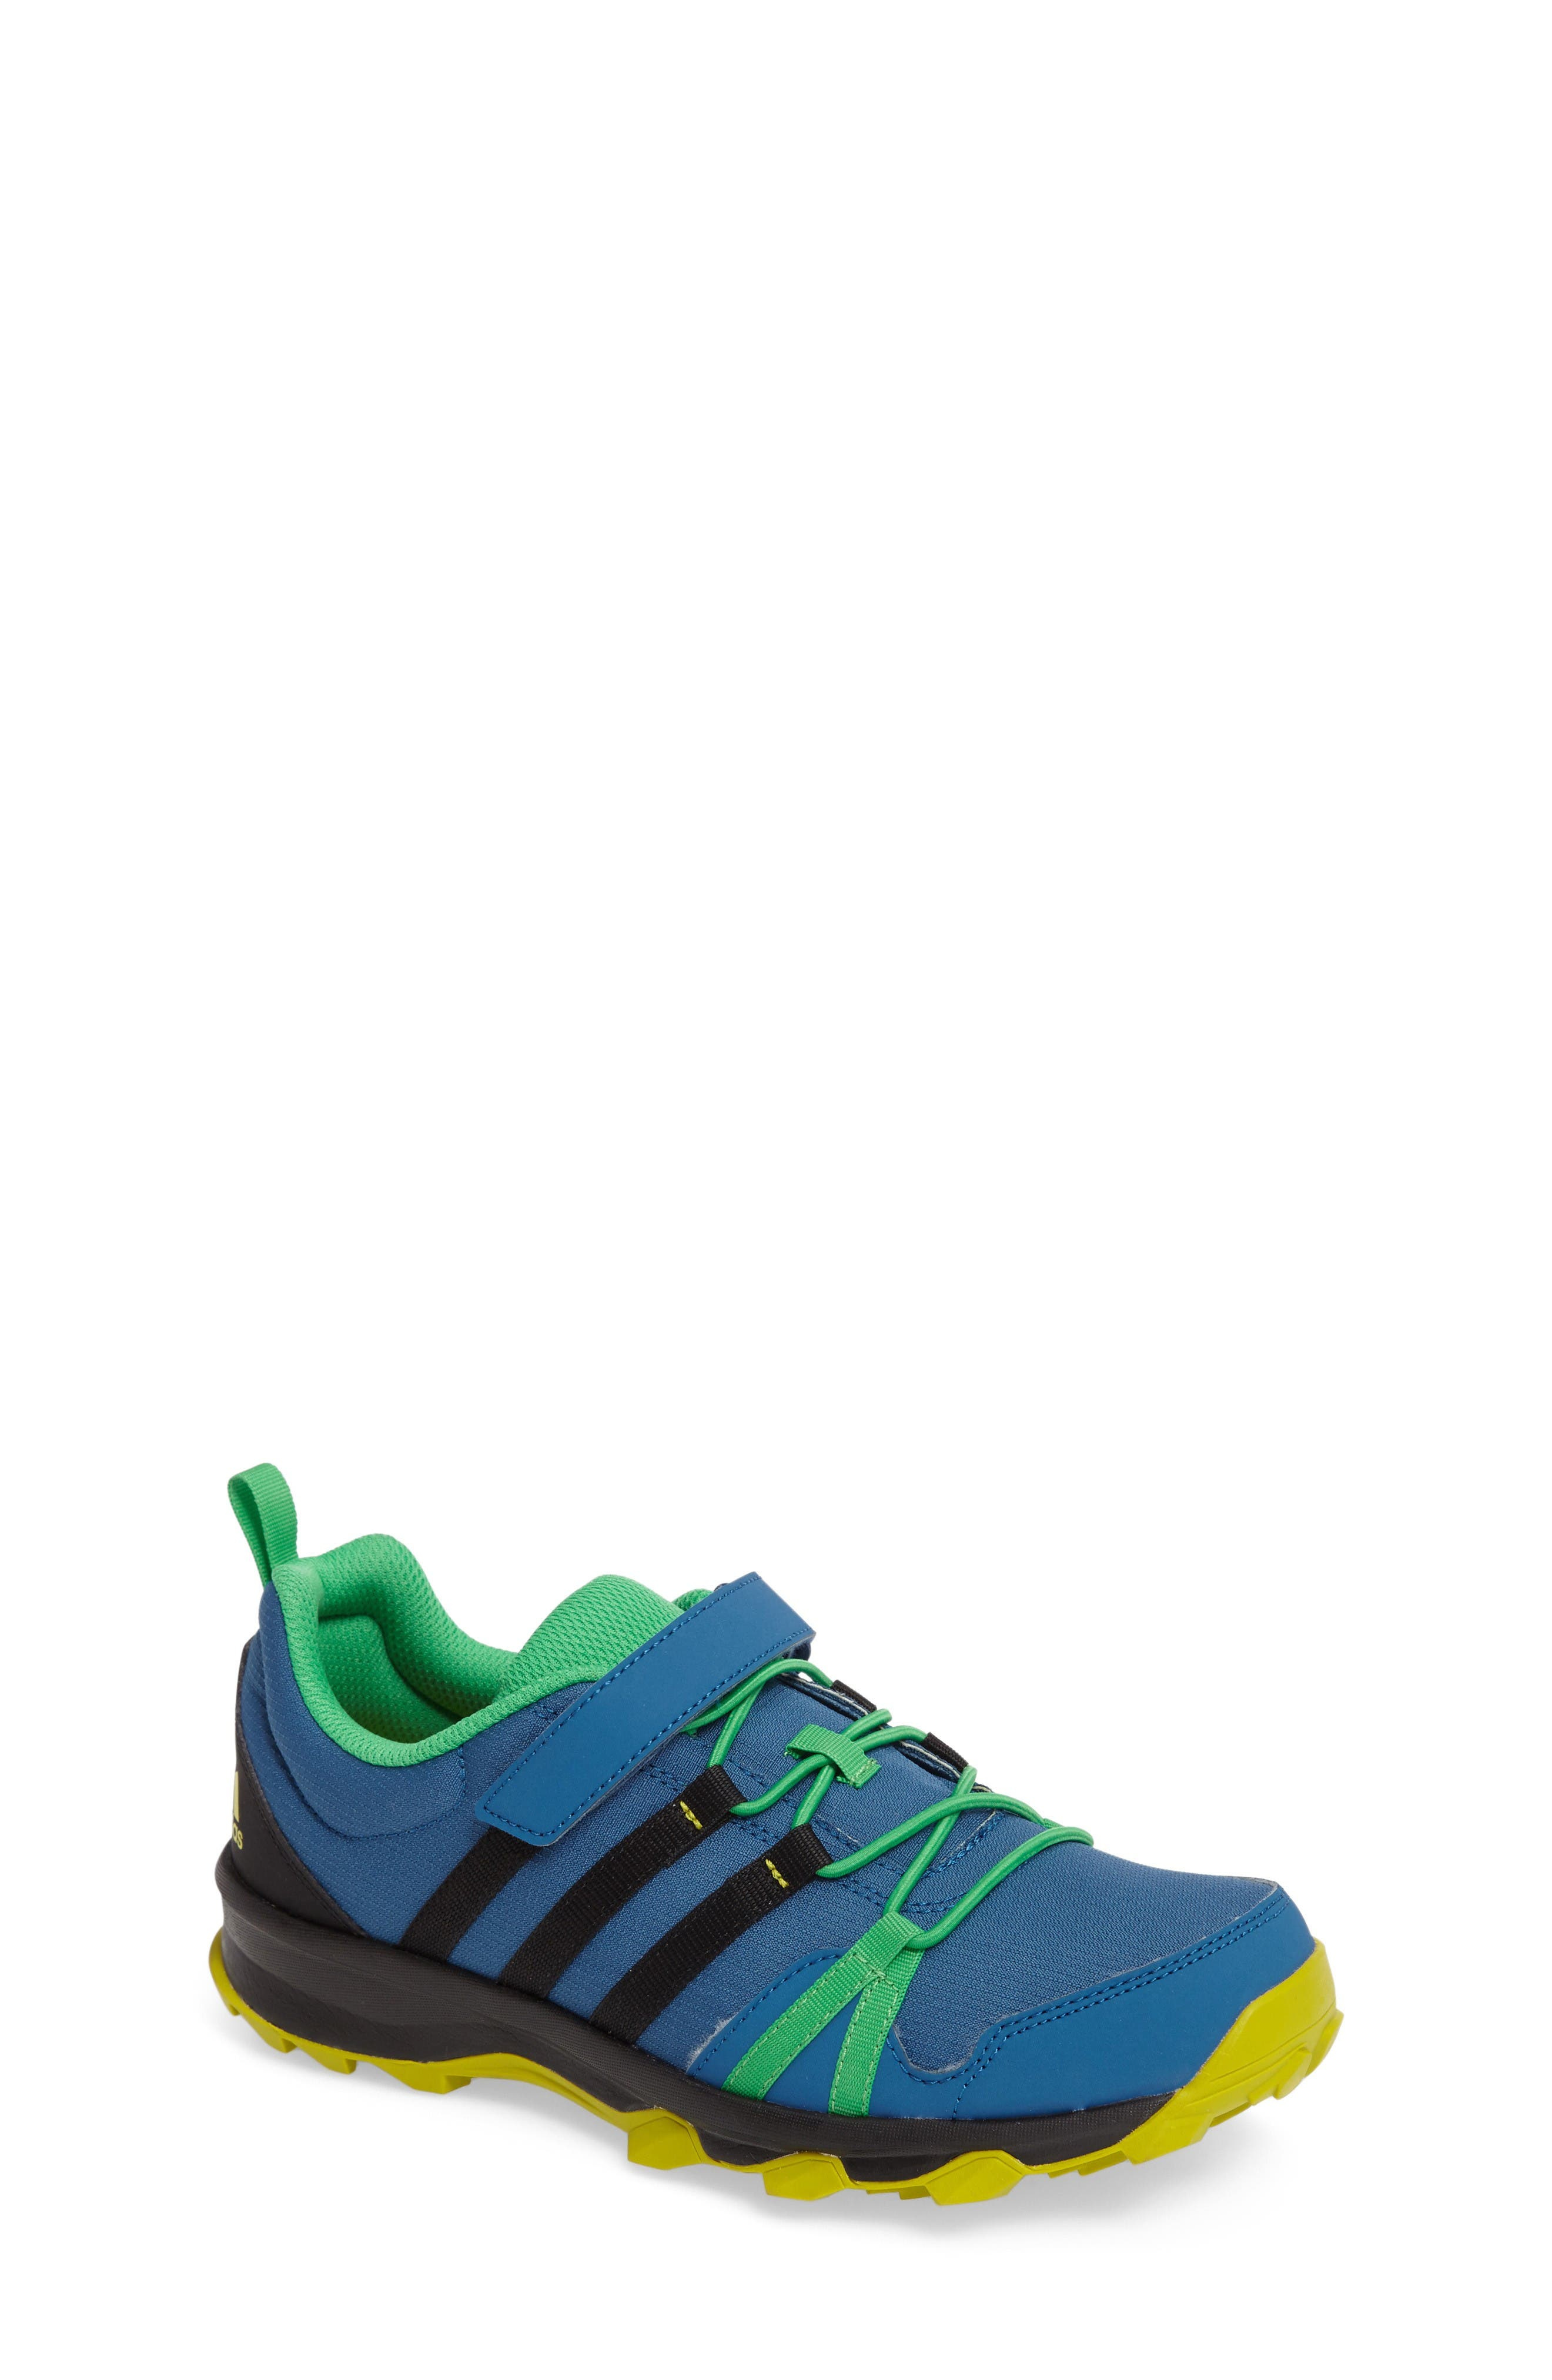 adidas Tracerocker Sneaker (Toddler, Little Kid & Big Kid)